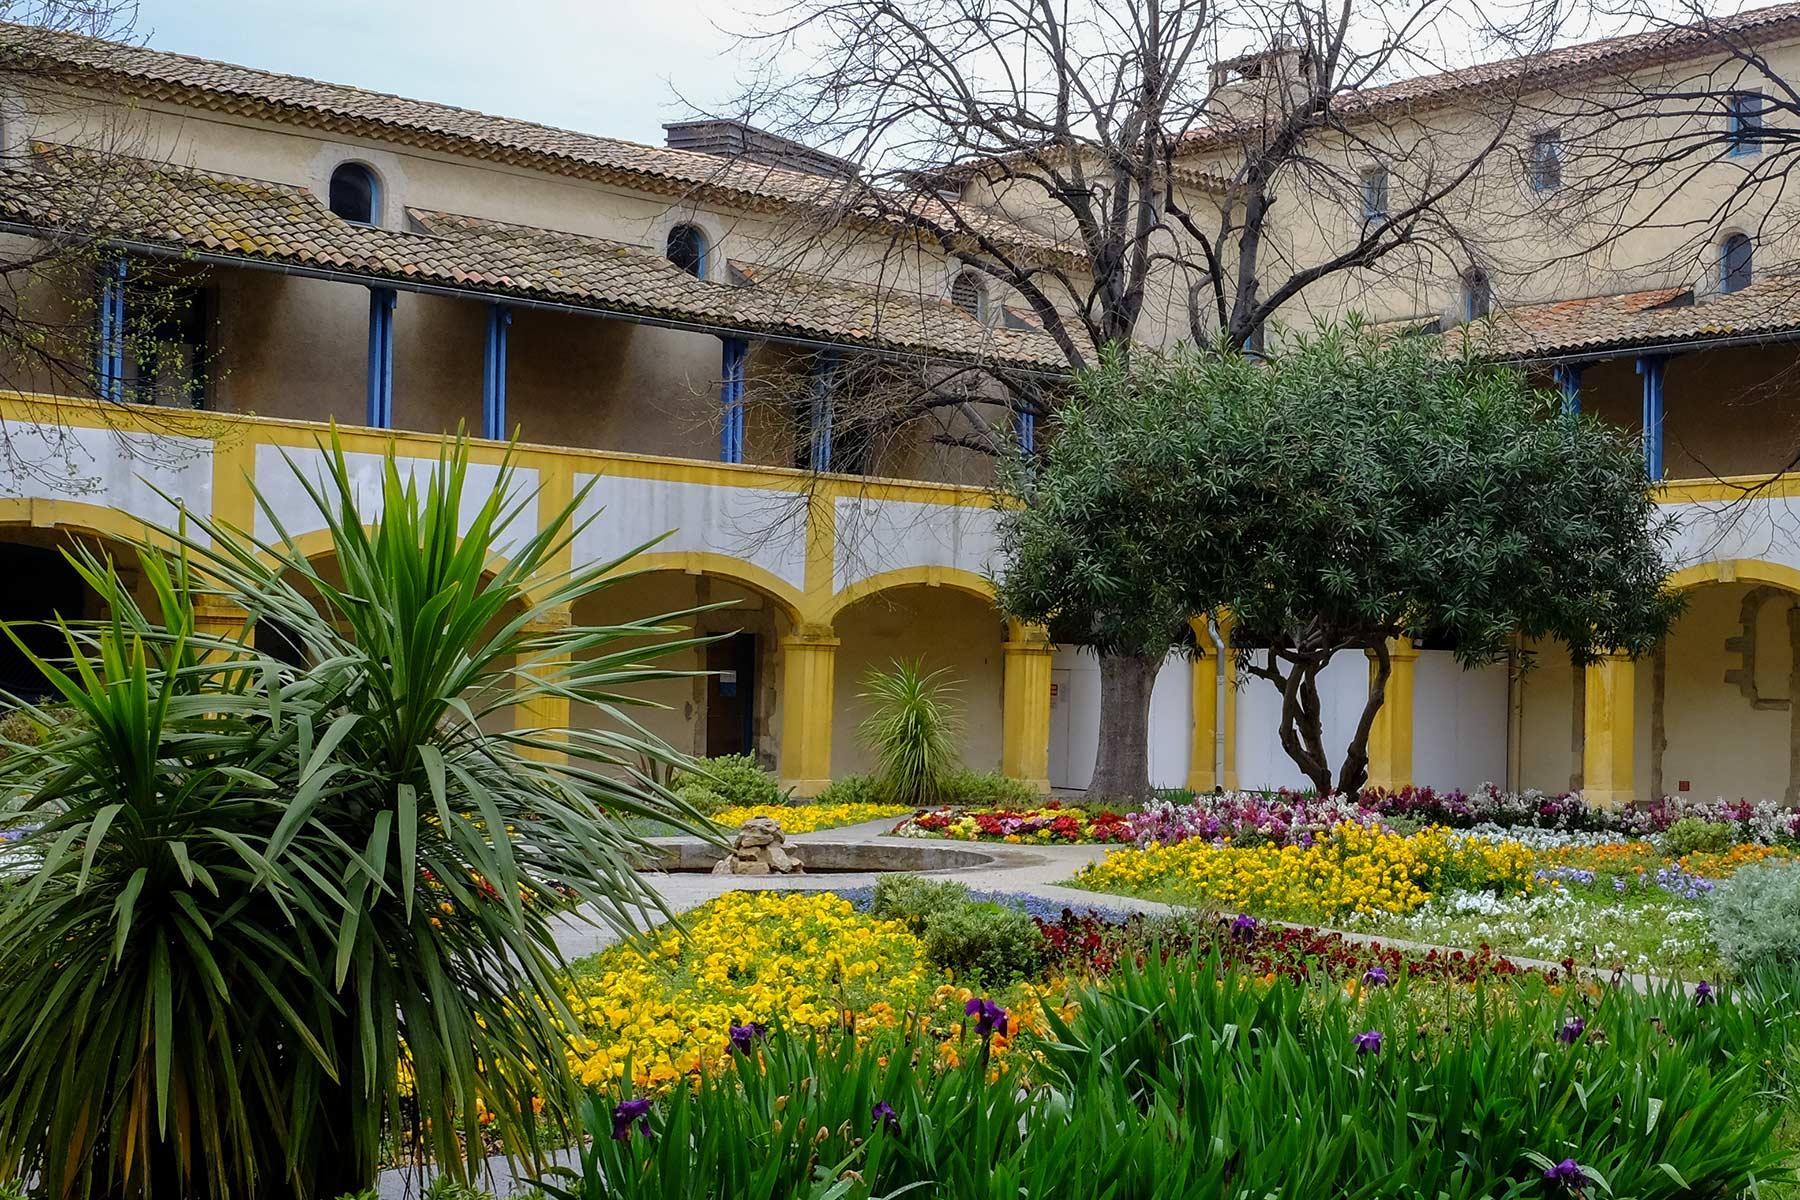 L'espace Van Gogh in Arles, Frankreich